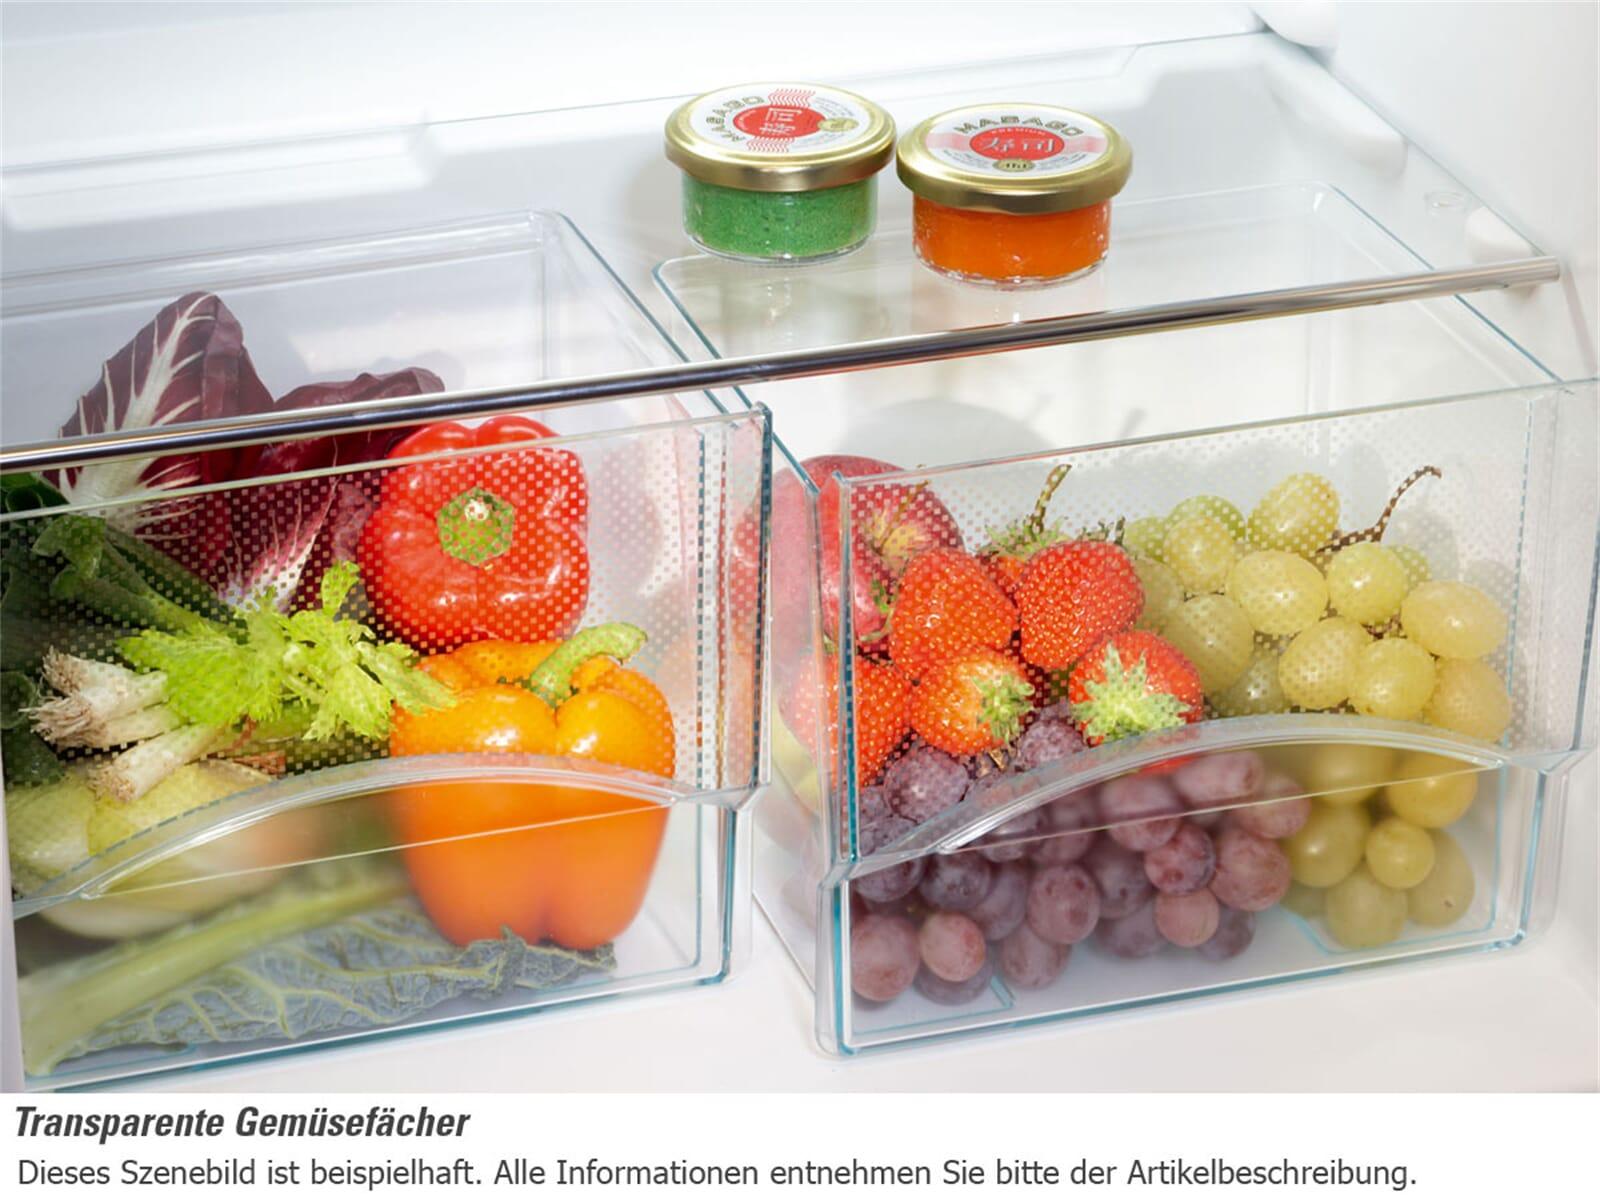 Liebherr CPel 4313 Kühl-Gefrierkombination Edelstahl A+++